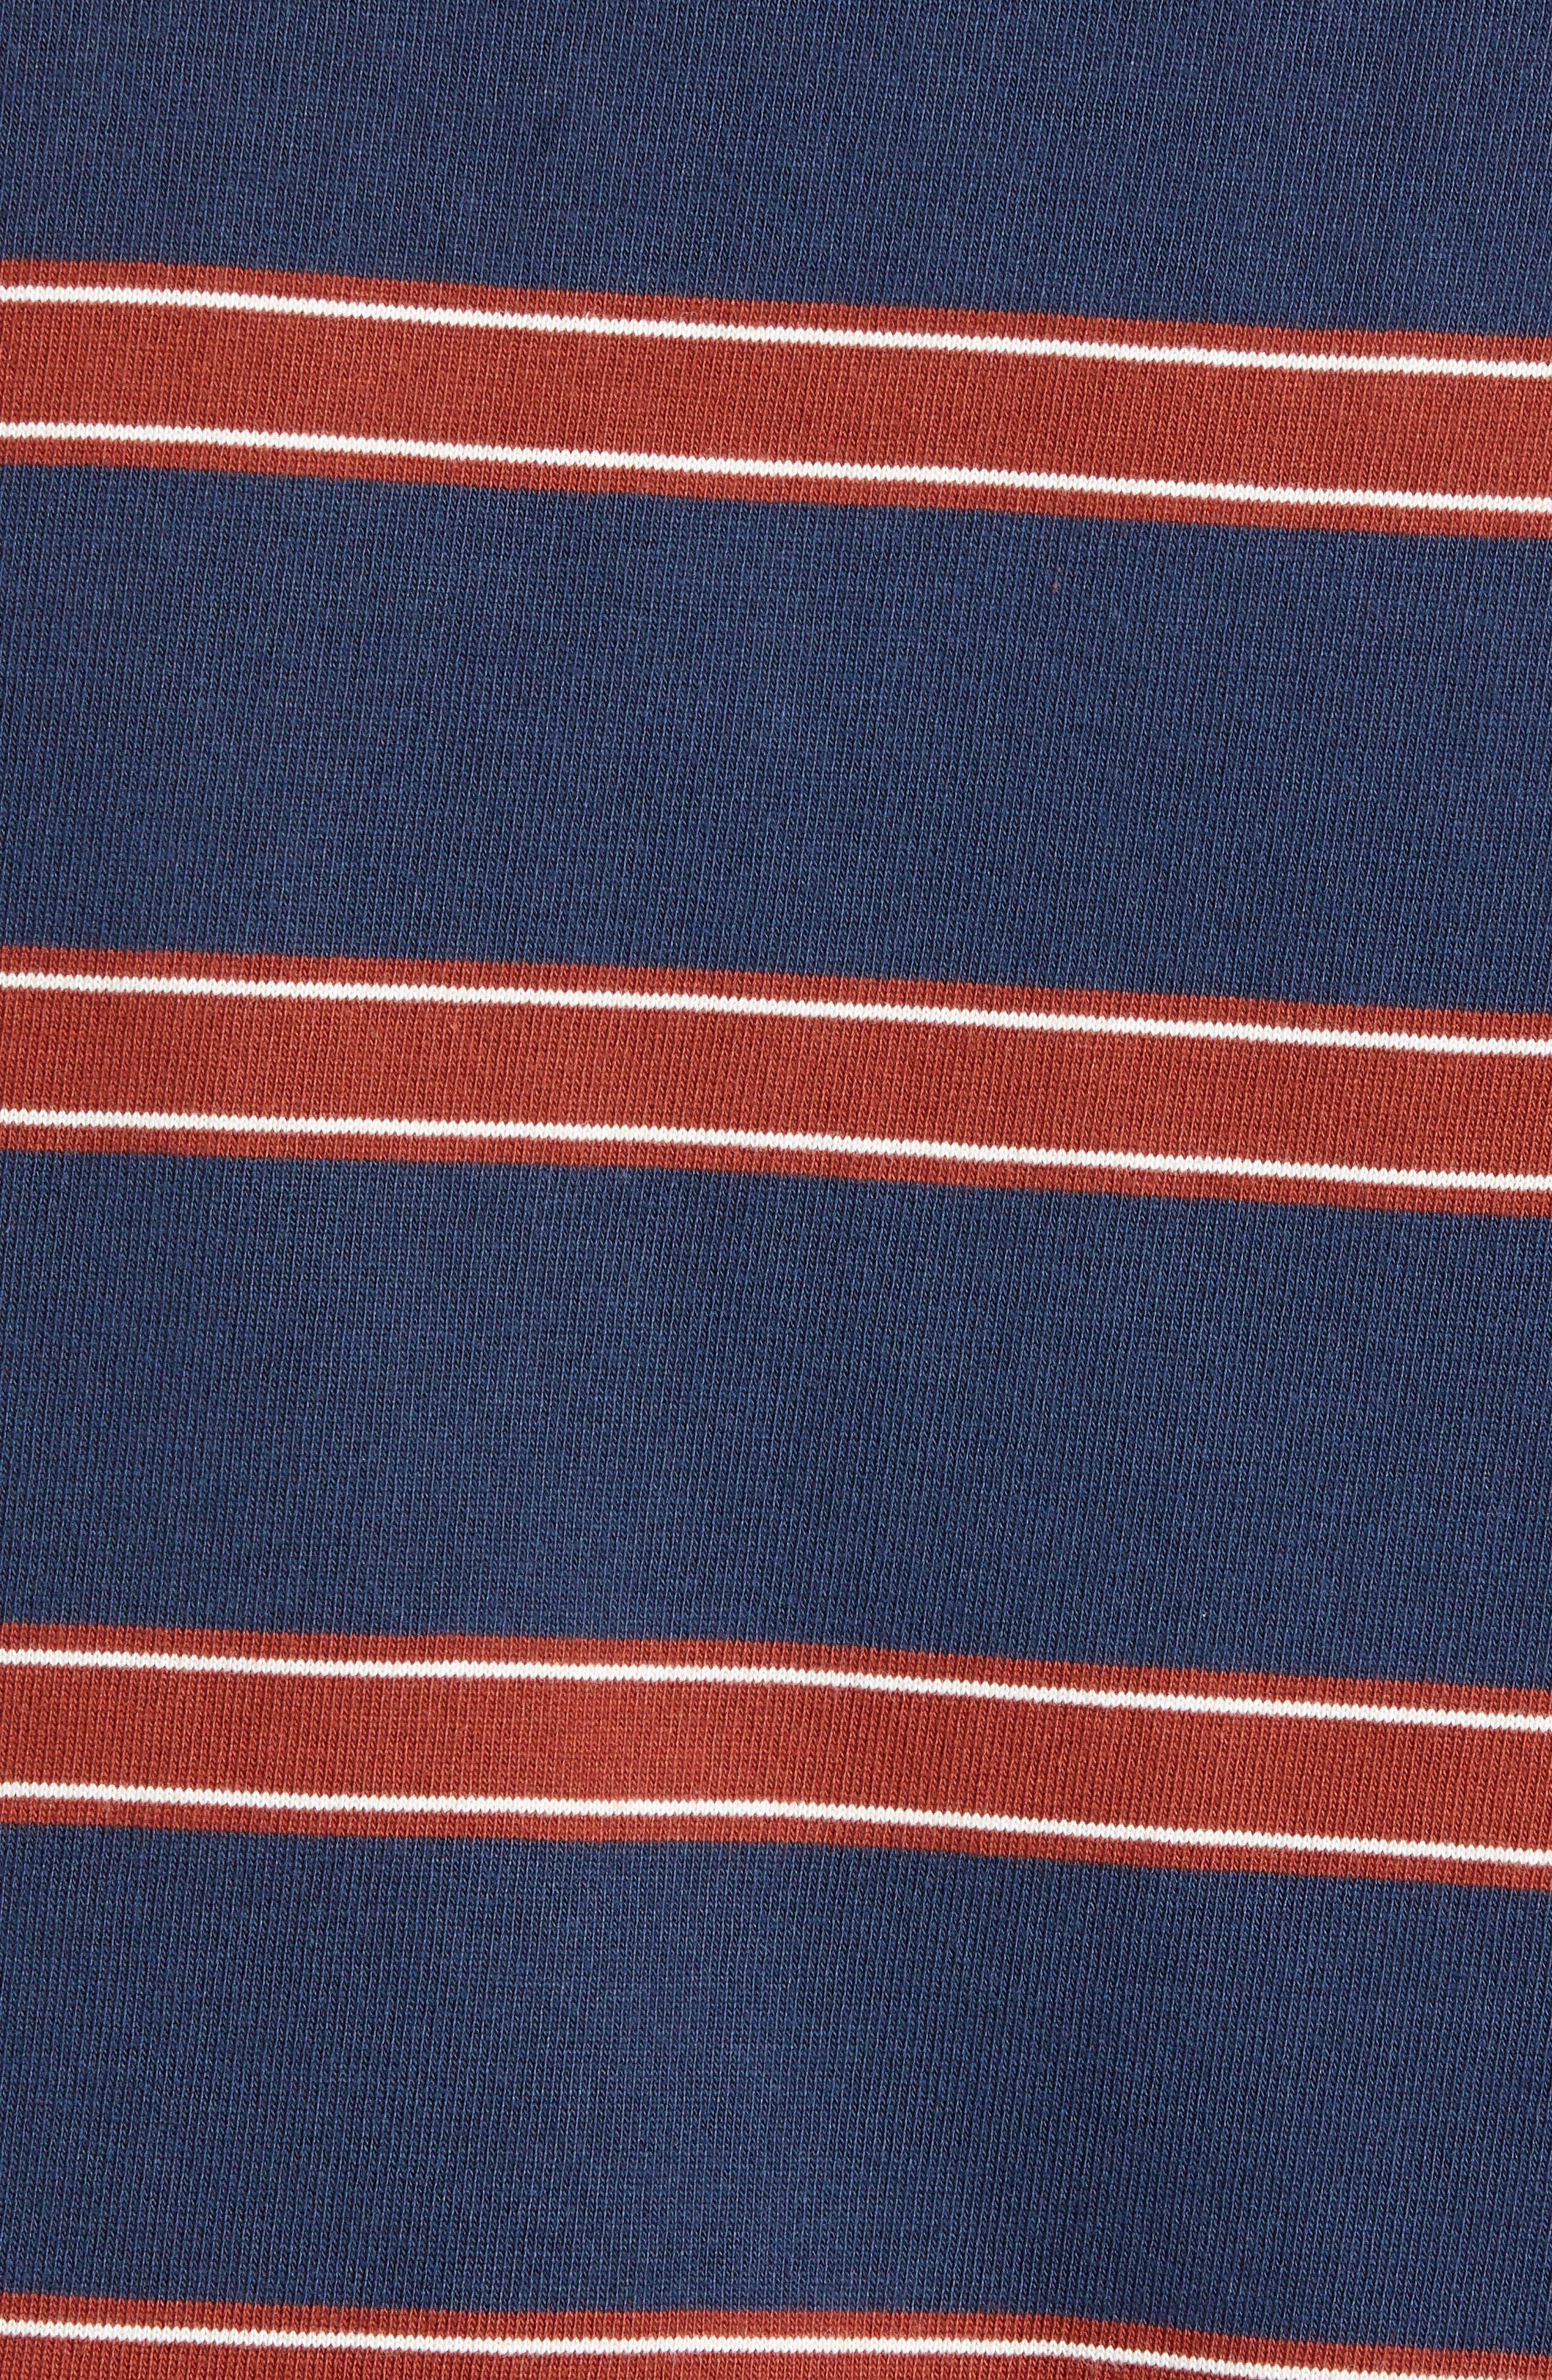 Watson Striped Long Sleeve T-Shirt,                             Alternate thumbnail 5, color,                             DRESS BLUES